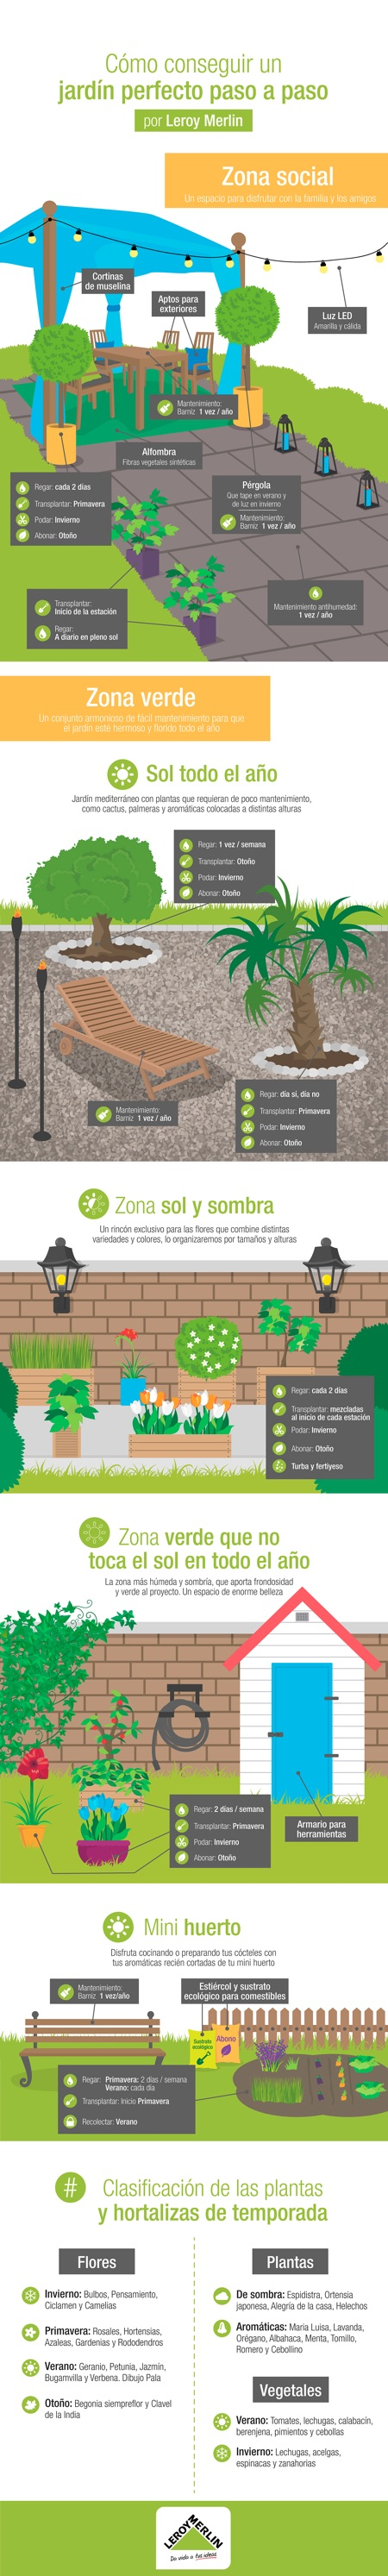 Infografia Jardin Perfecto 3